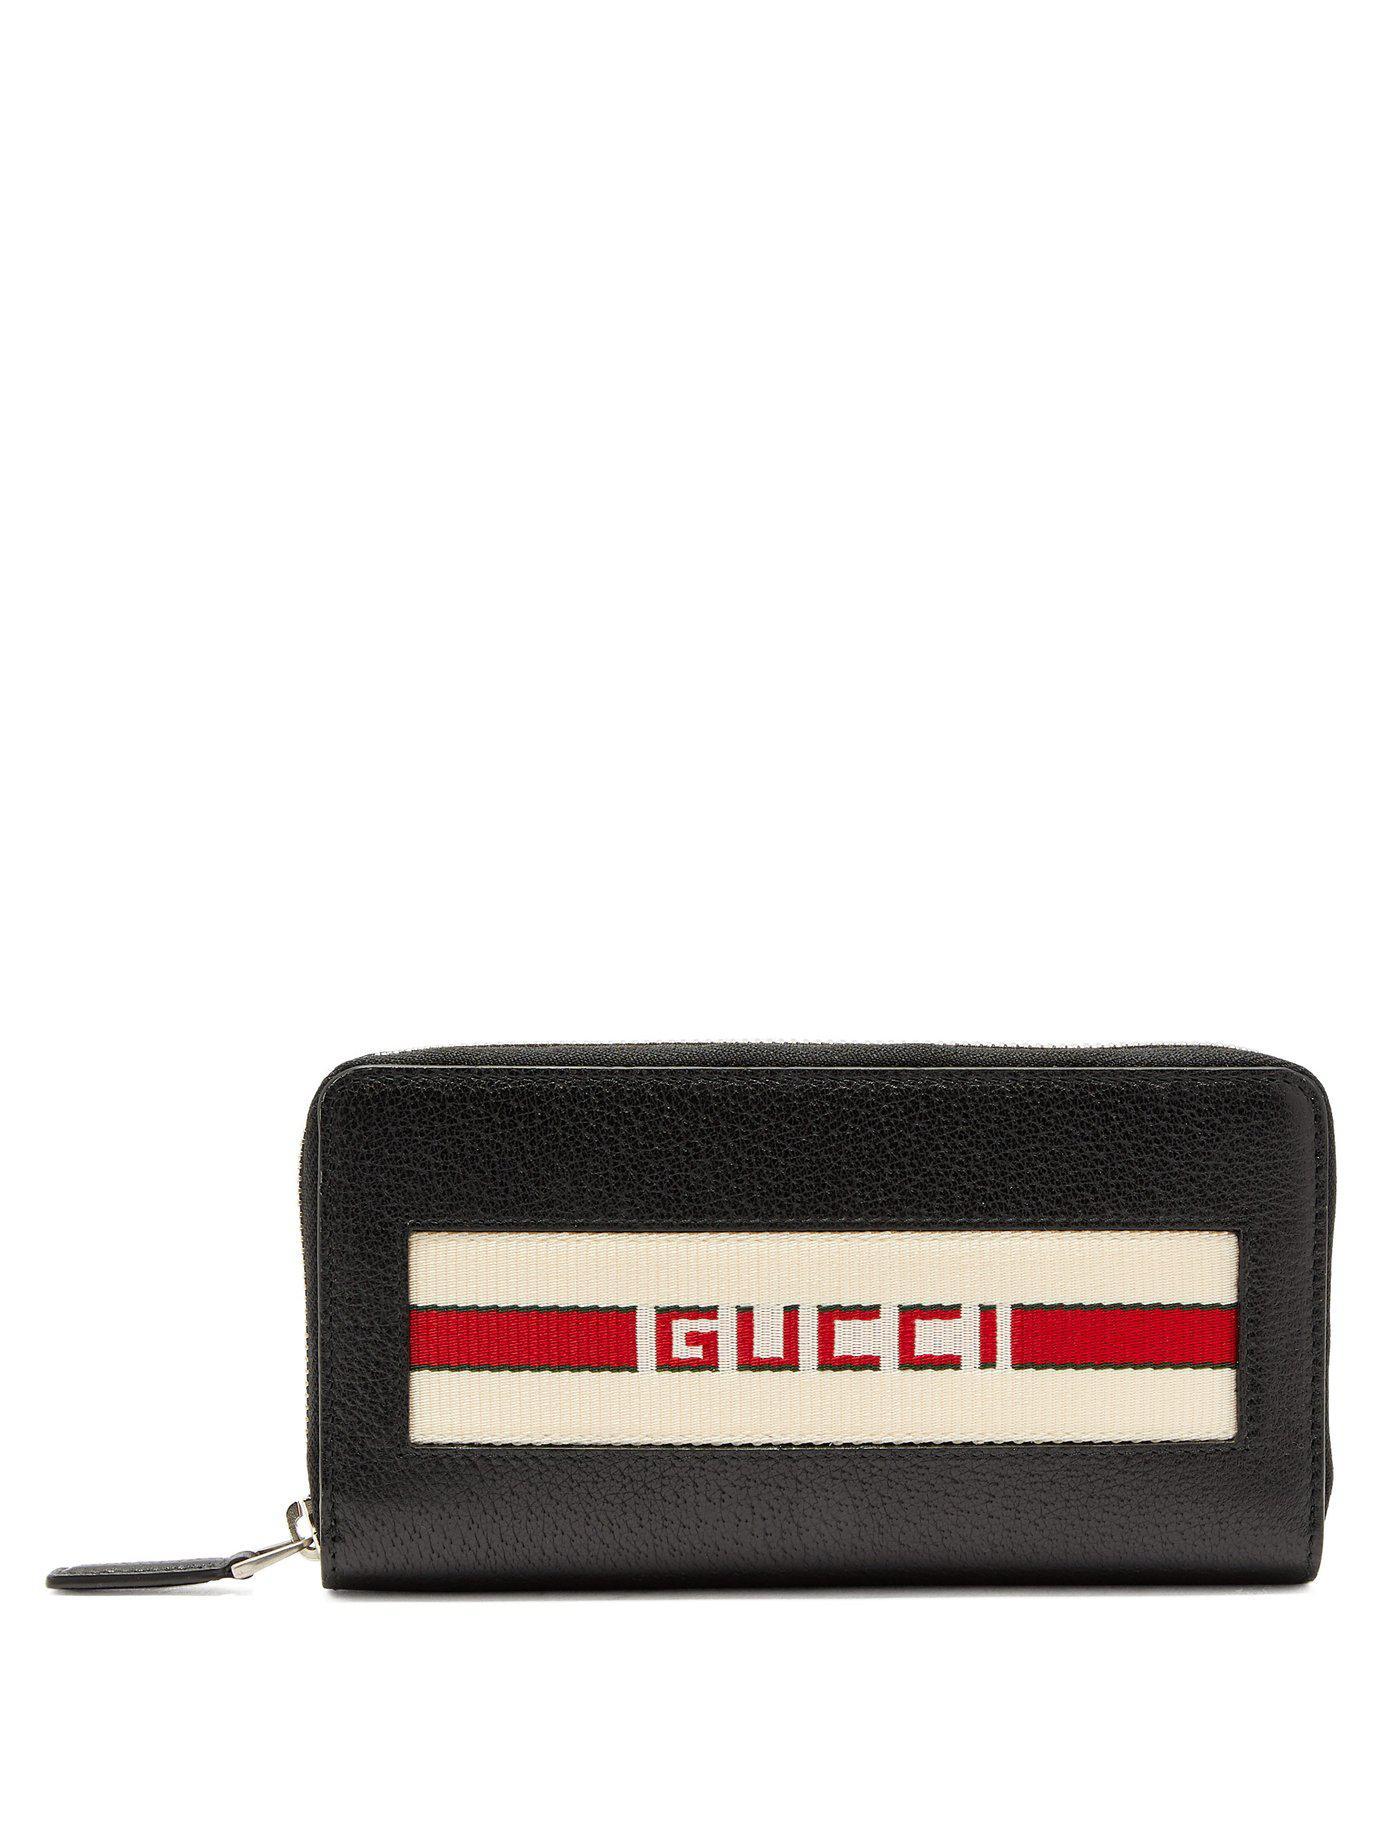 5f9c2f36436d11 Gucci Logo Stripe Jacquard Leather Wallet in Black for Men - Lyst